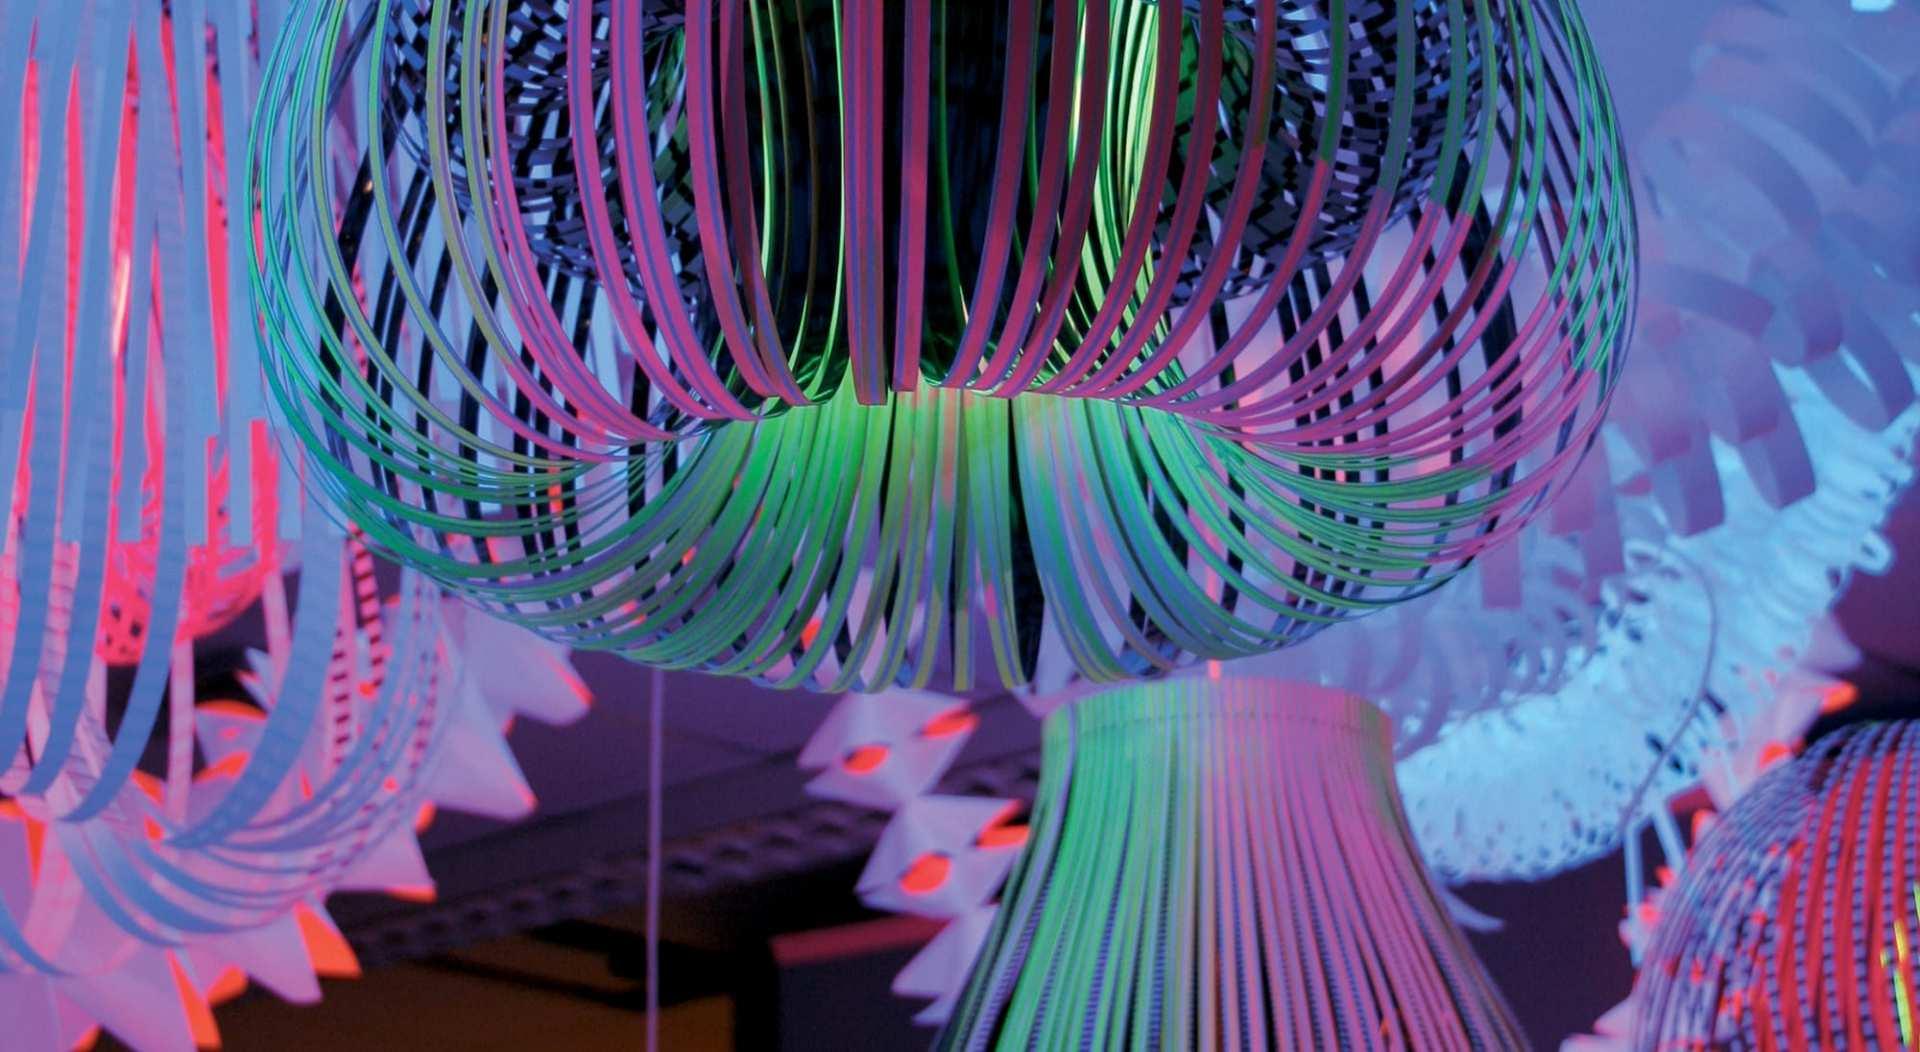 paper_light_installation_setdesign_design__art_paula_arntzen